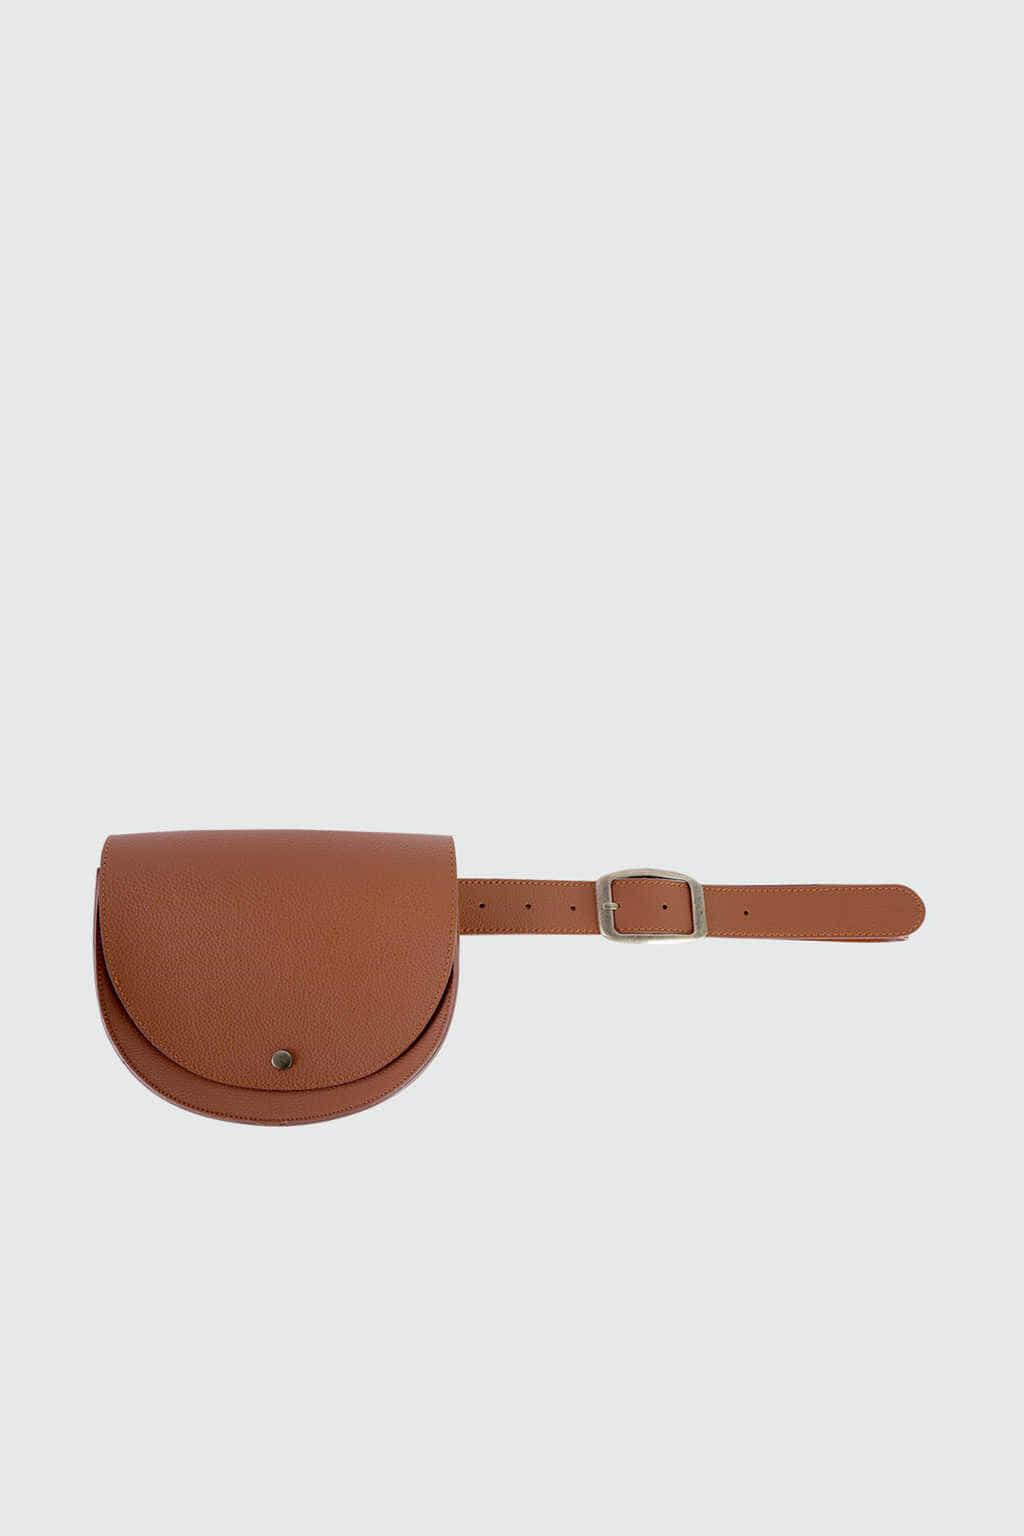 Waist Bag J001 Brown 5